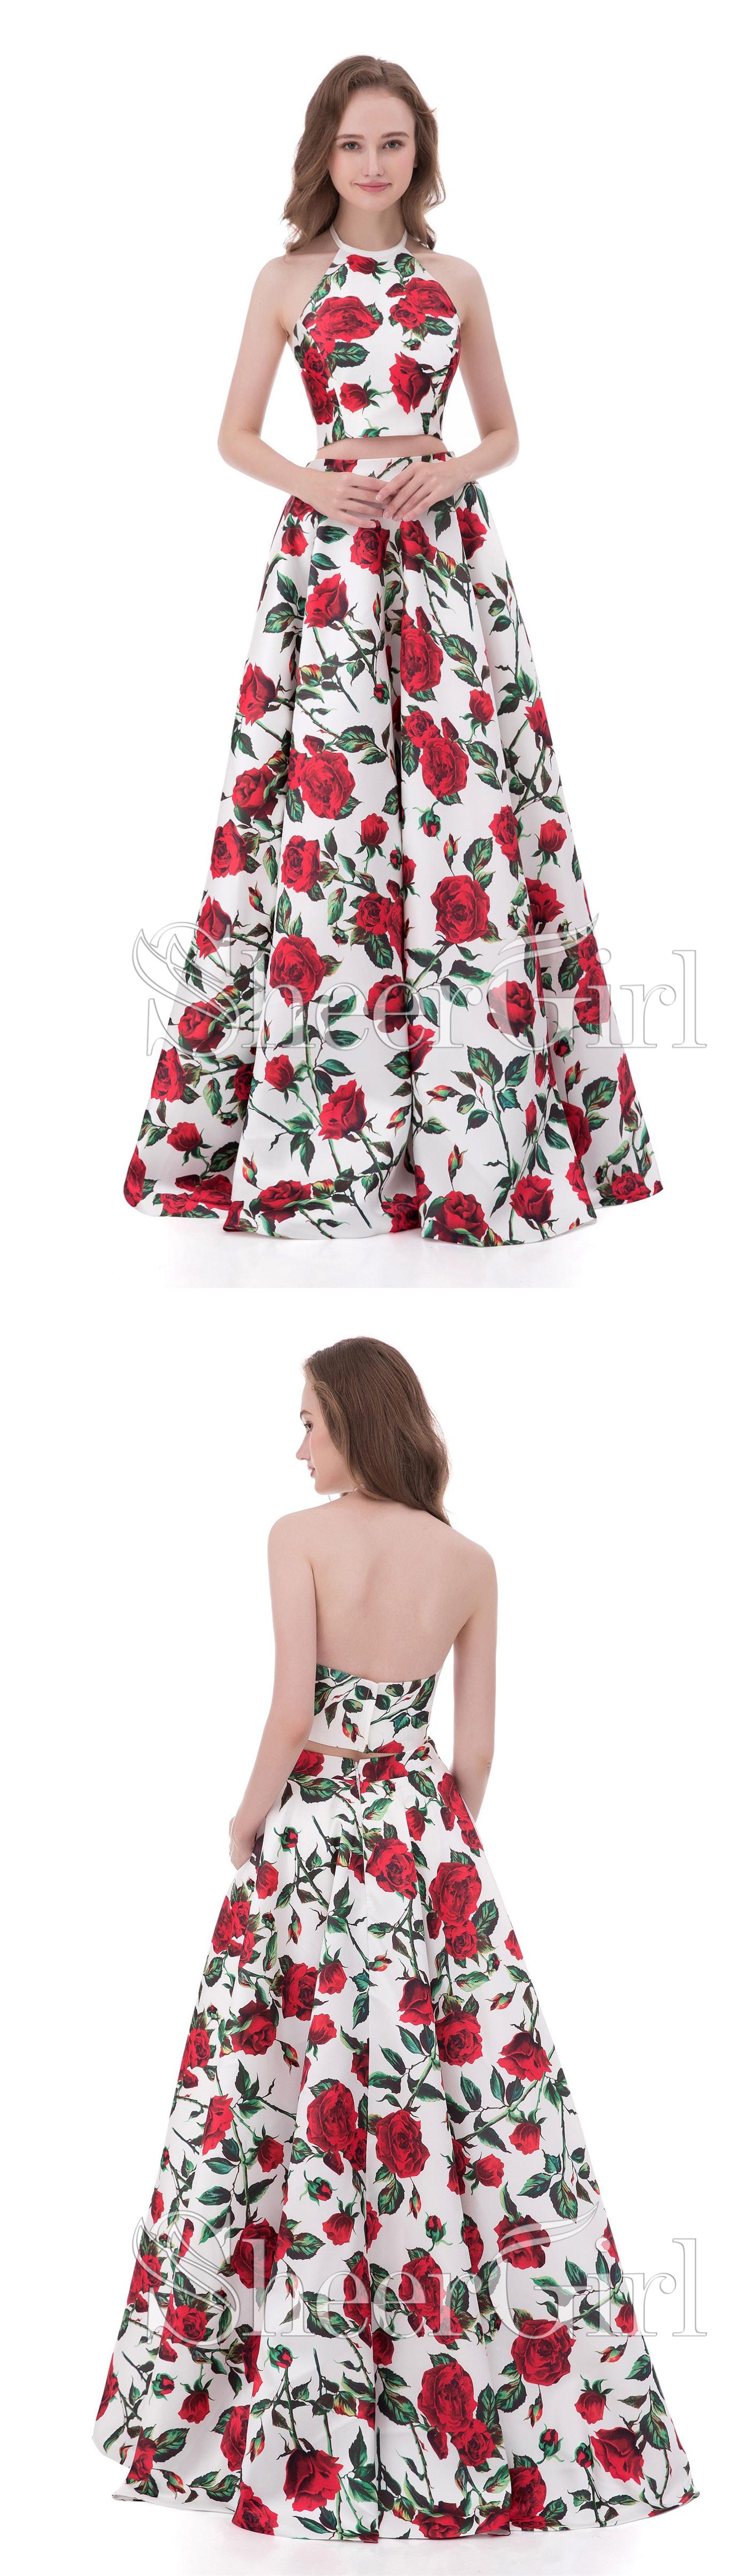 A-line/Princess Halter Two Piece Floral Cheap Prom Dresses APD3056